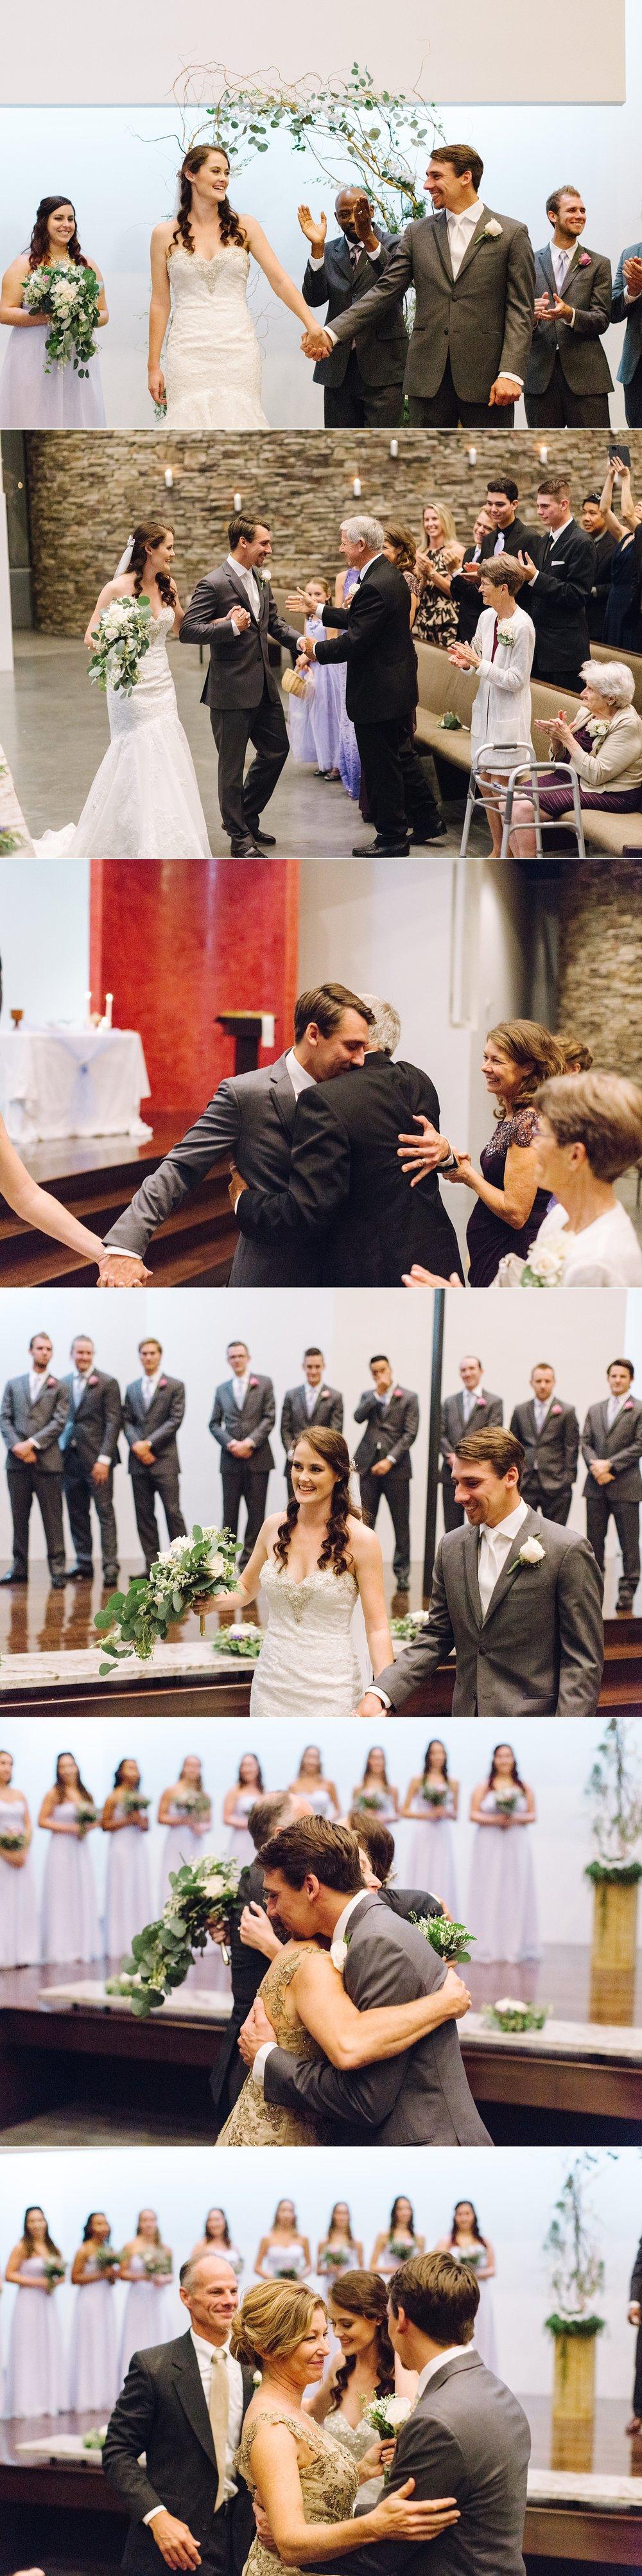 wa wedding blog-36.jpg